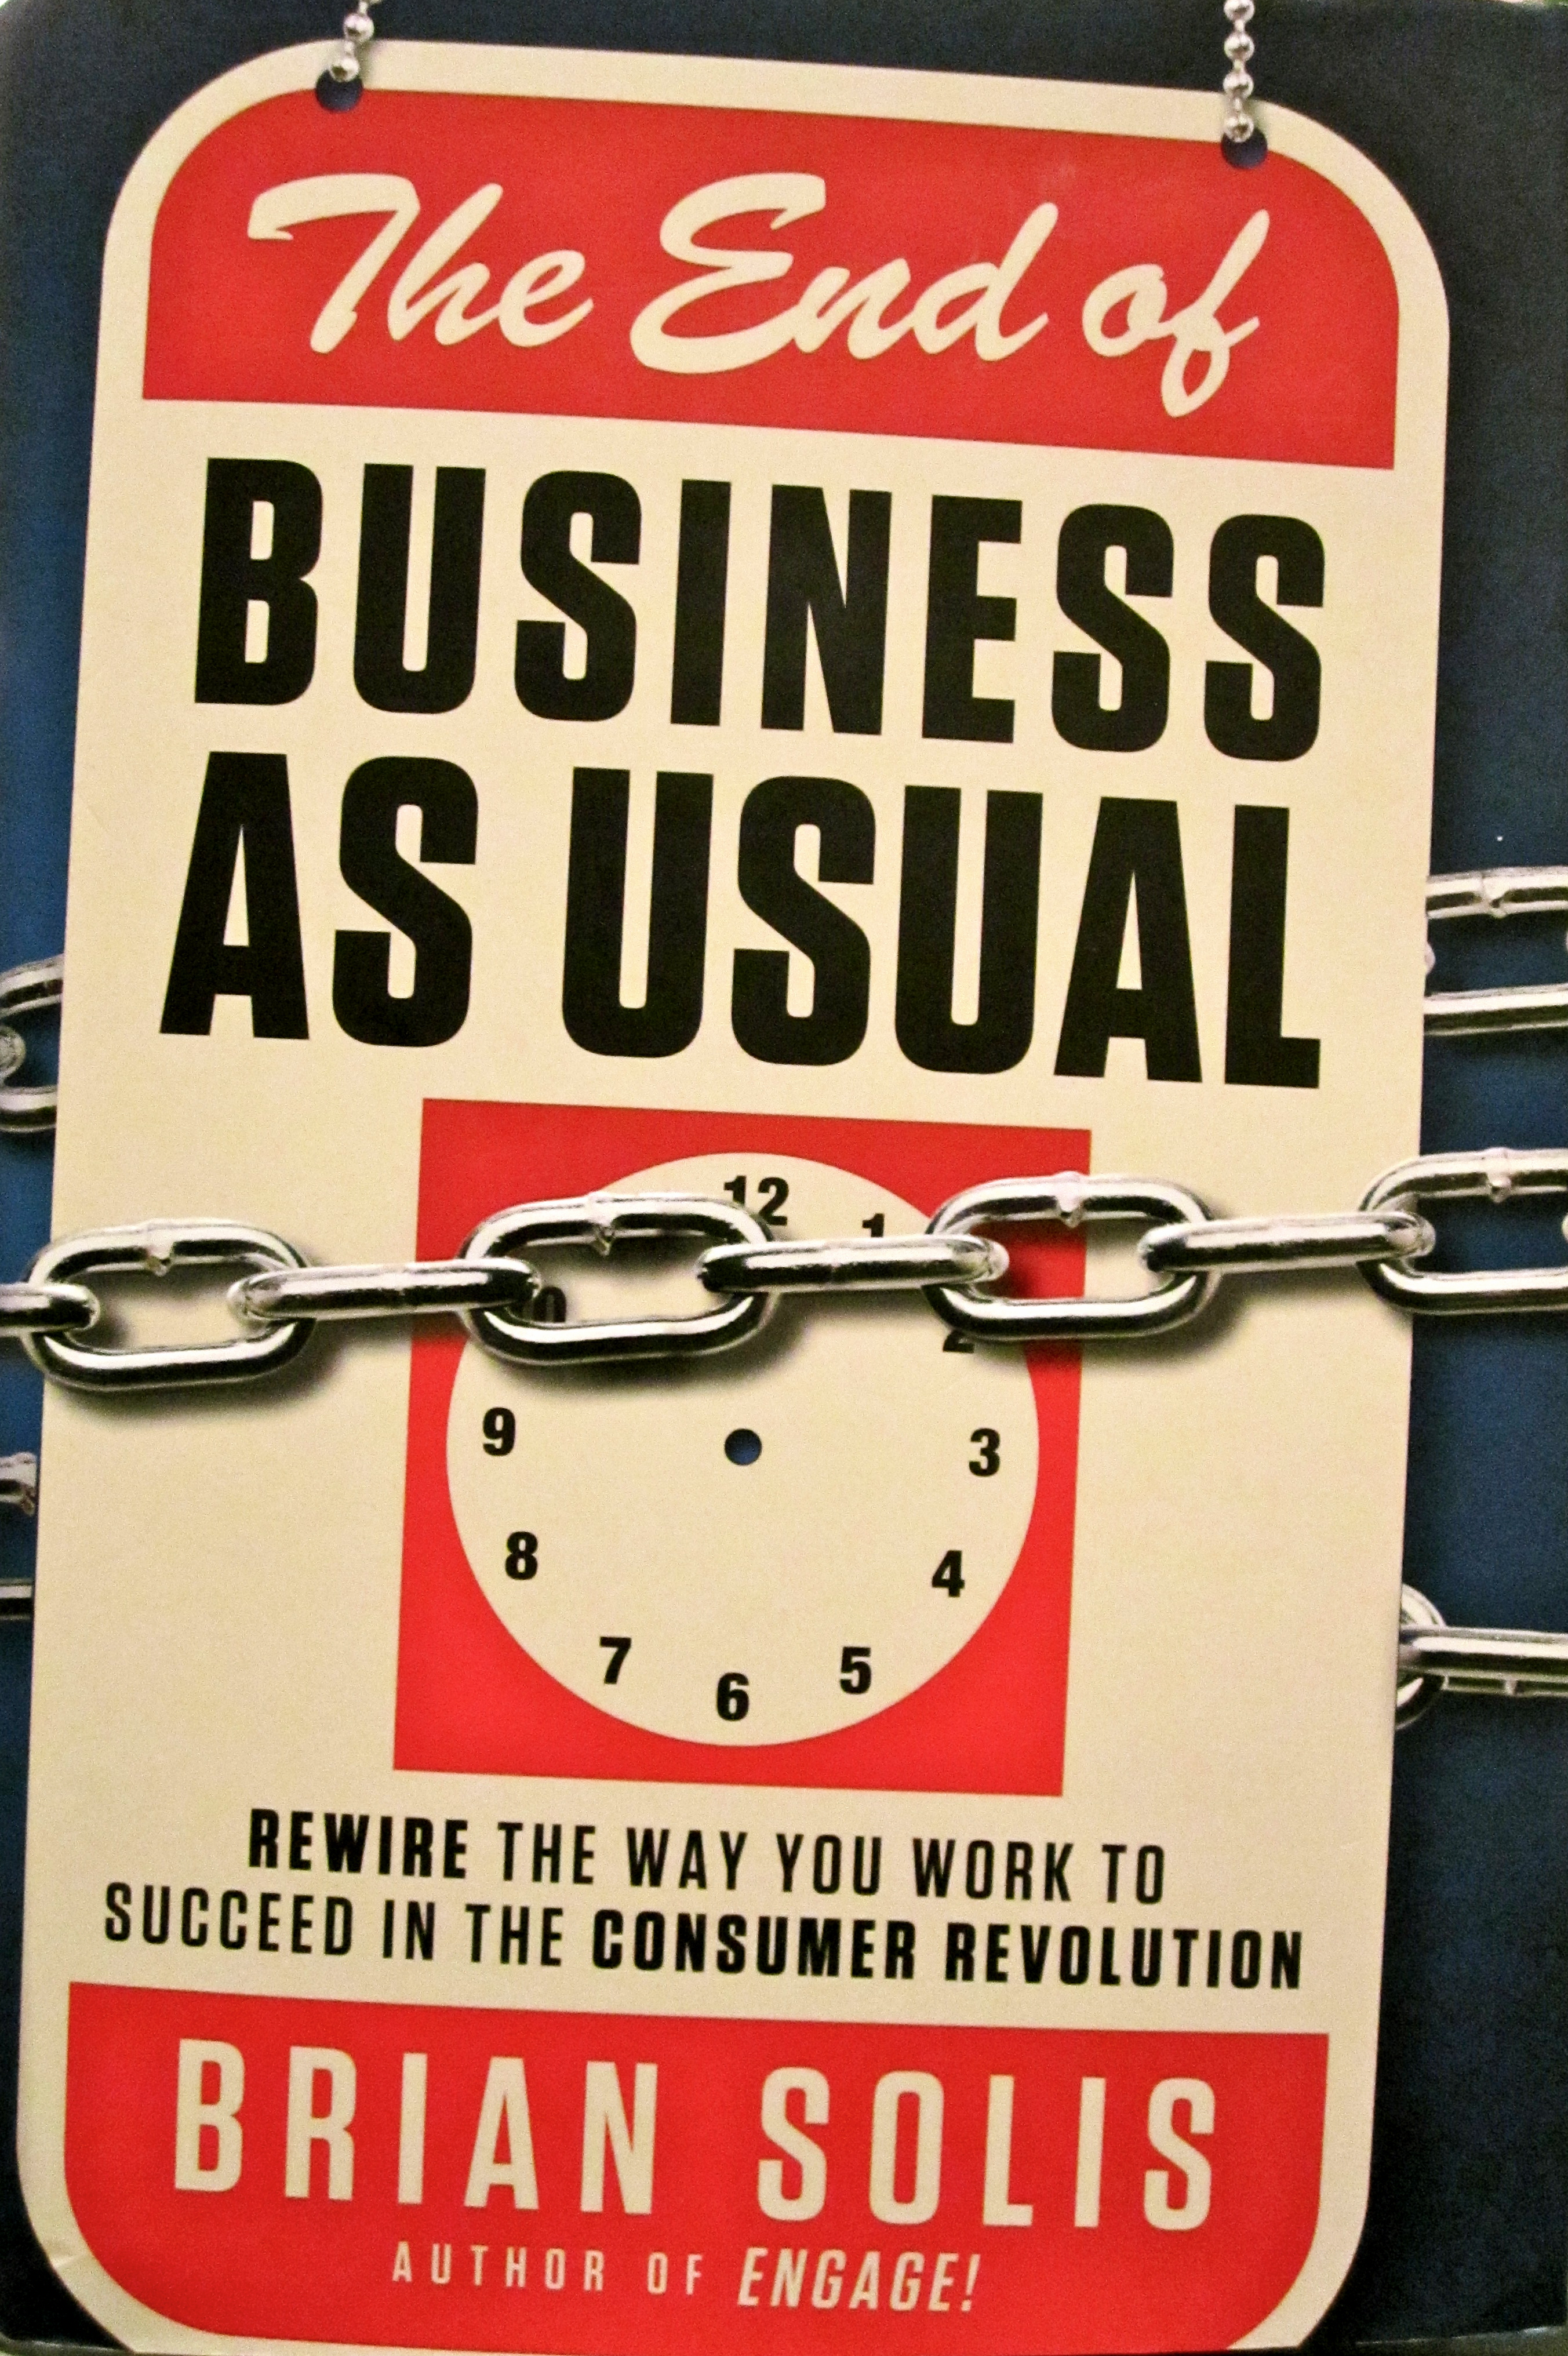 9 Criteria for Establishing Your Business' Brand Essence